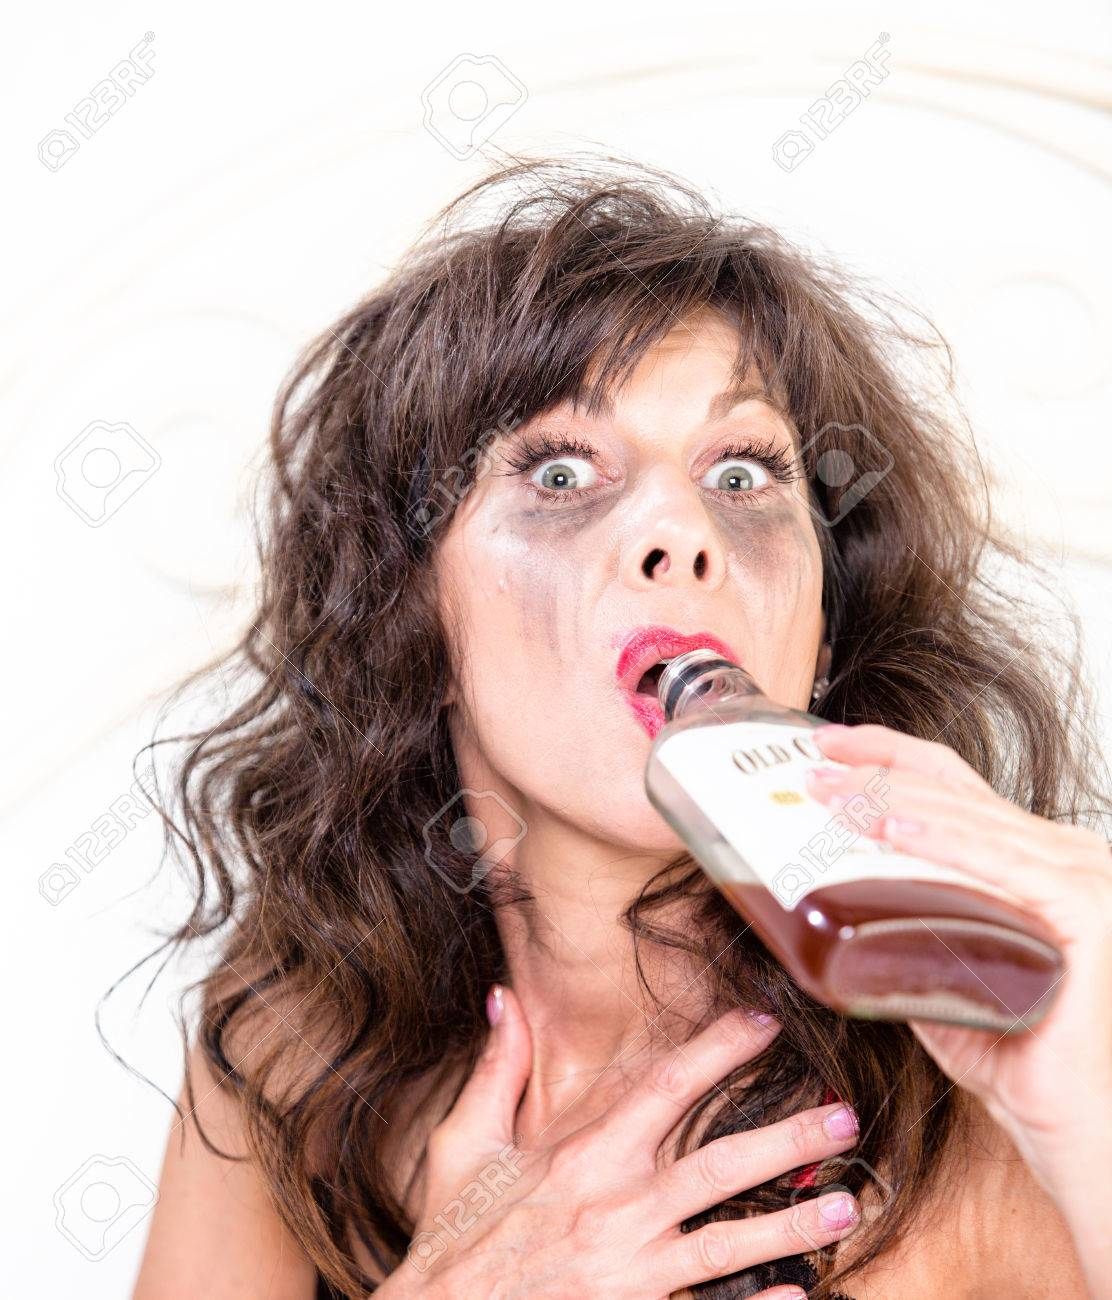 BETSY: Free drunk mature